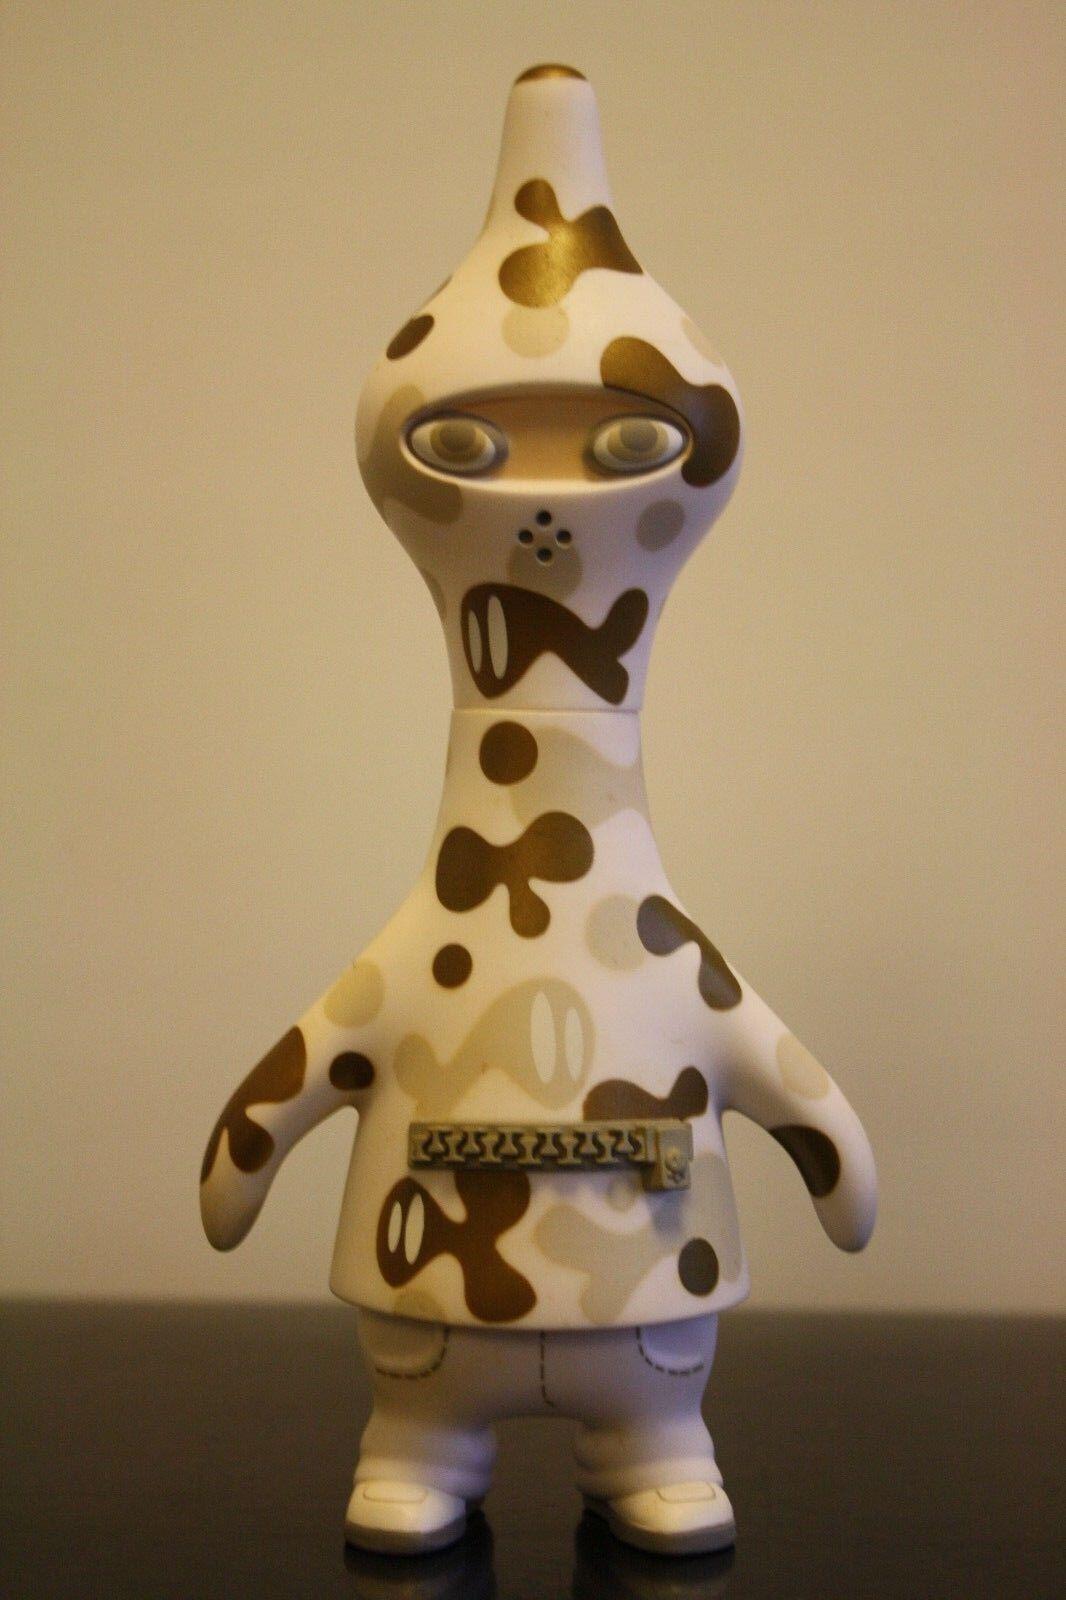 PETE FOWLER Playbeast Designer Toy CAMGUIN 7  WHITE year 2003